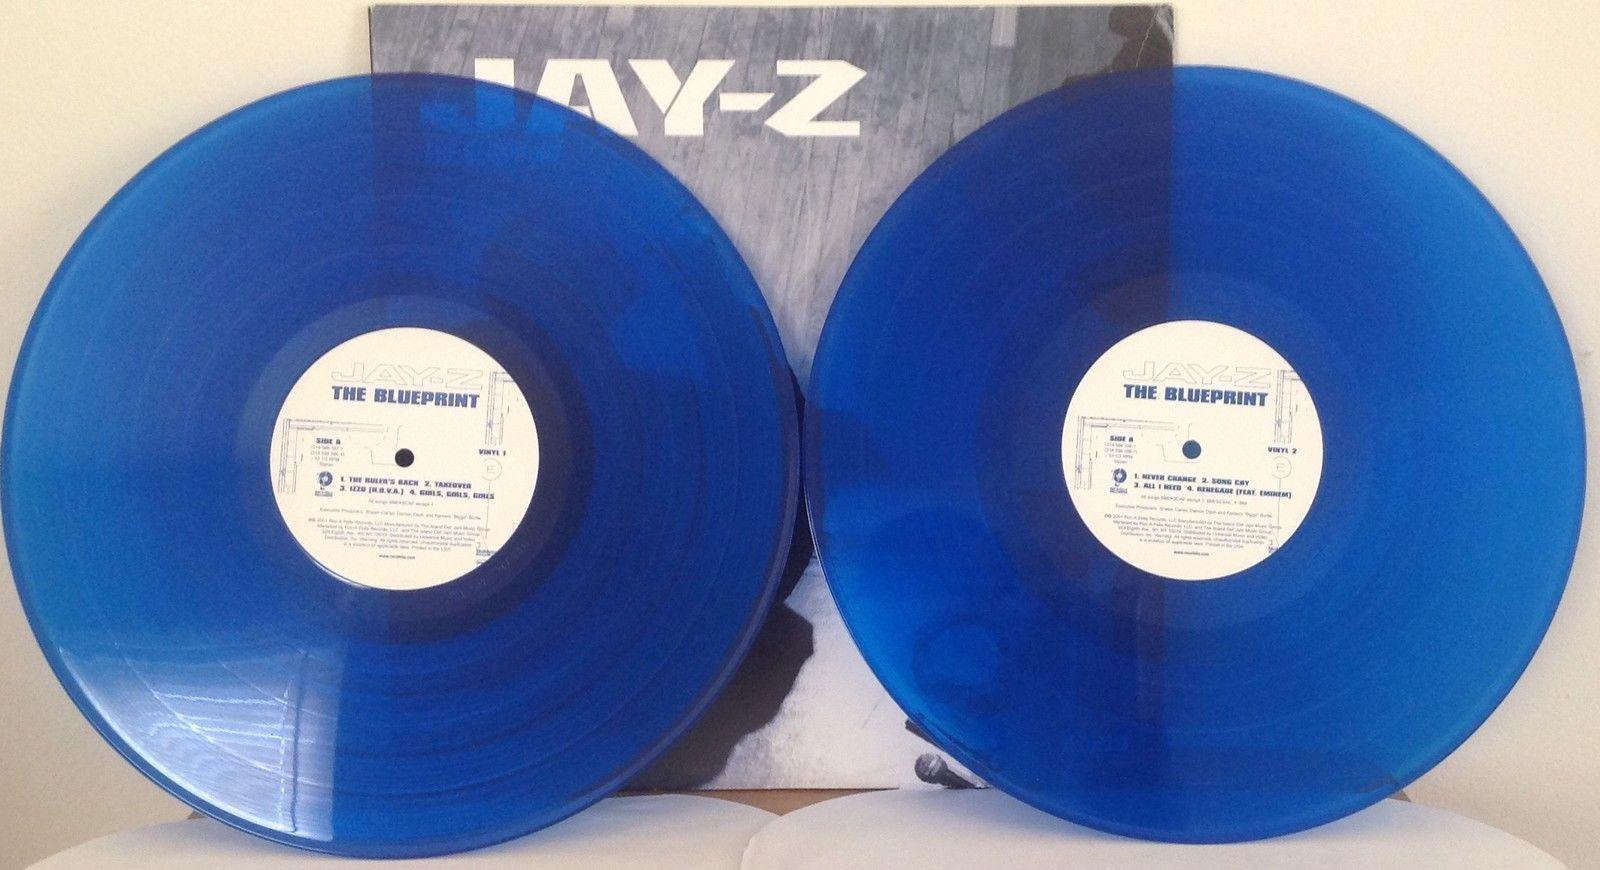 Jay z the blueprint original promo blue vinyl 2 lp 2001 rocafella jay z the blueprint original promo blue vinyl 2 lp 2001 rocafella records kanye malvernweather Gallery